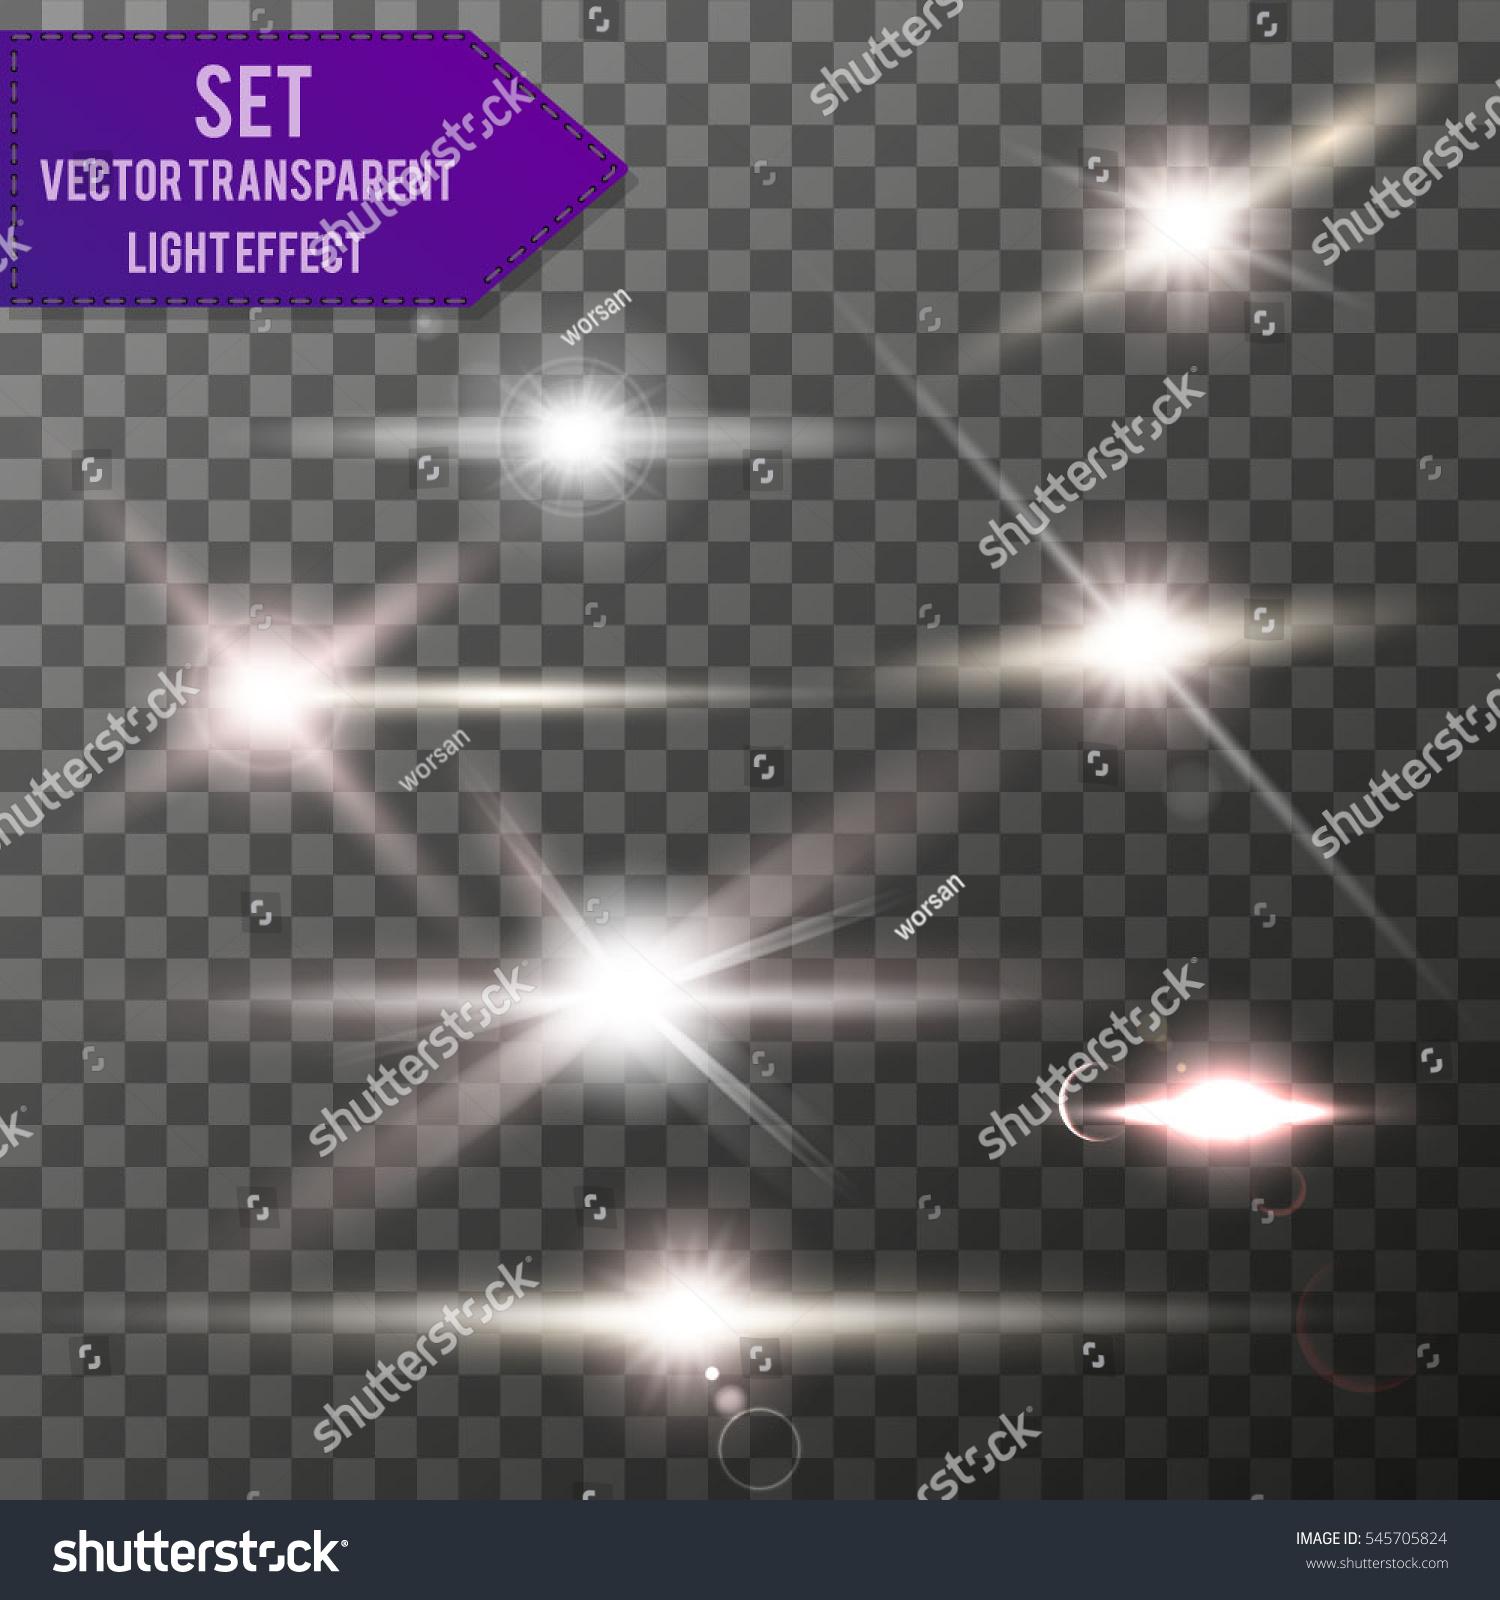 Realistic Lens Flare Elements Collection Light Effect Transparent Design Vector illustration